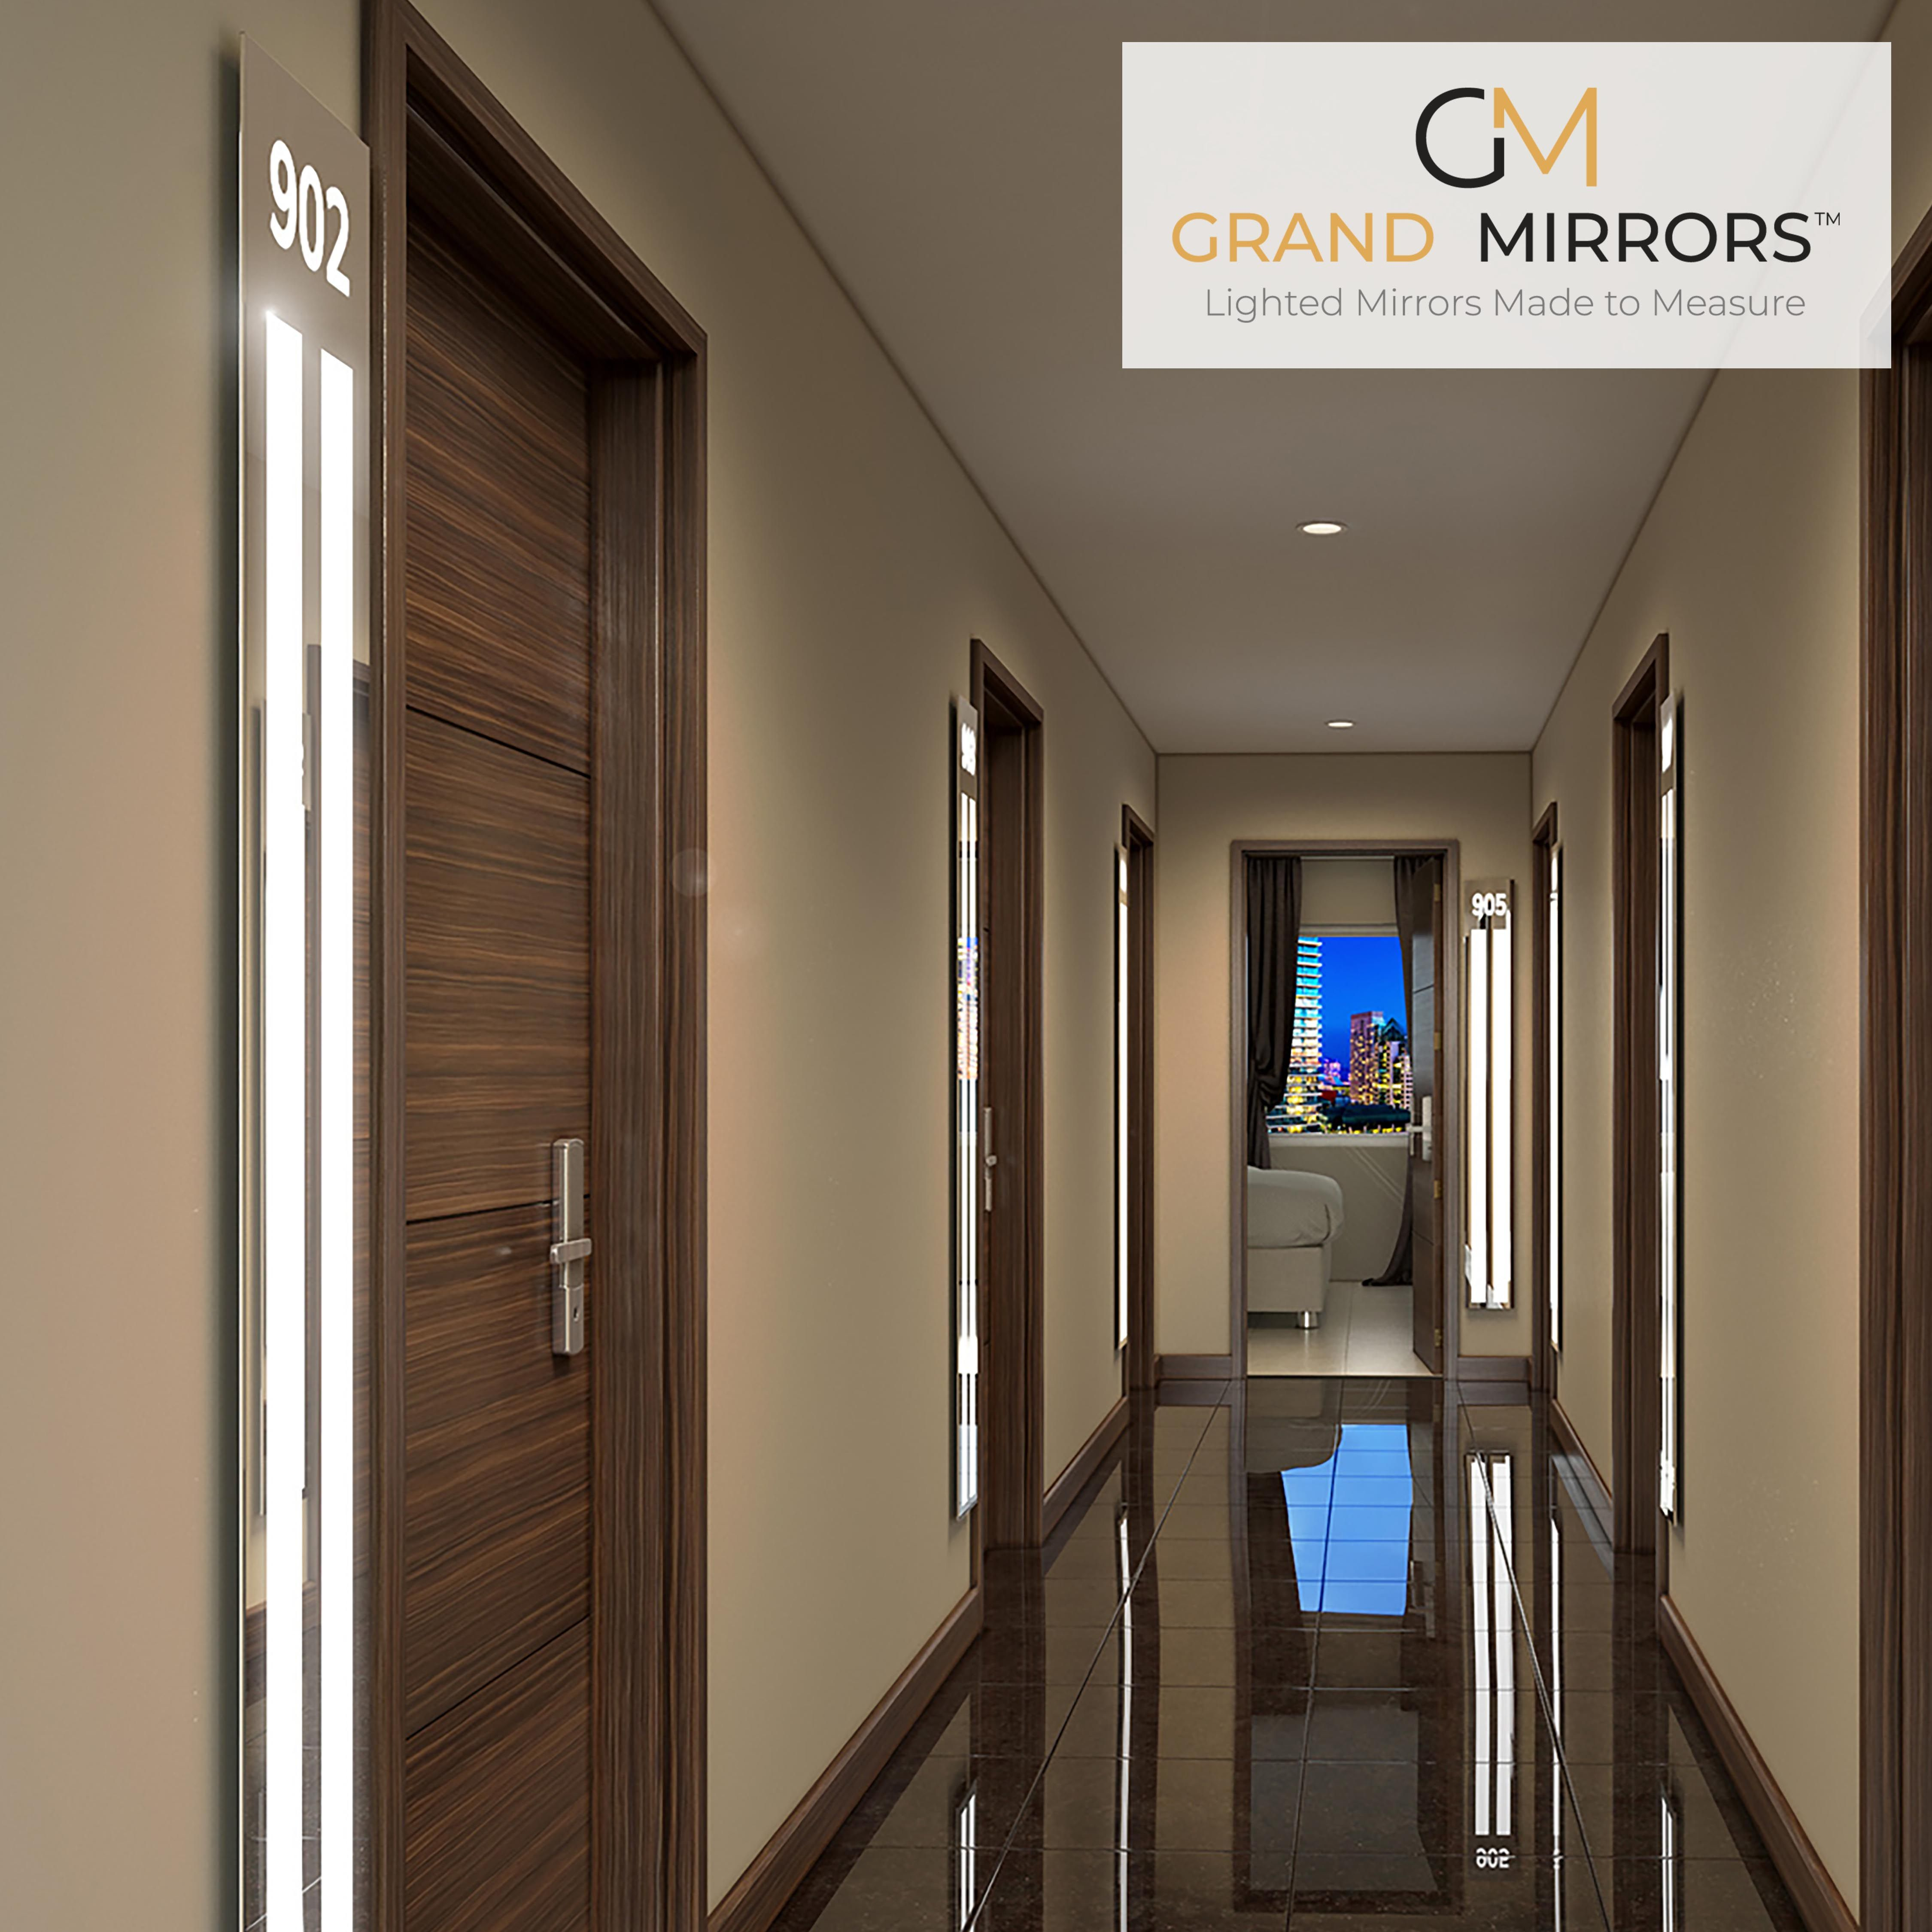 Integrated Light Mirrors Grand Mirrors Mirror With Lights Bathroom Mirror Lights Hallway Light Fixtures